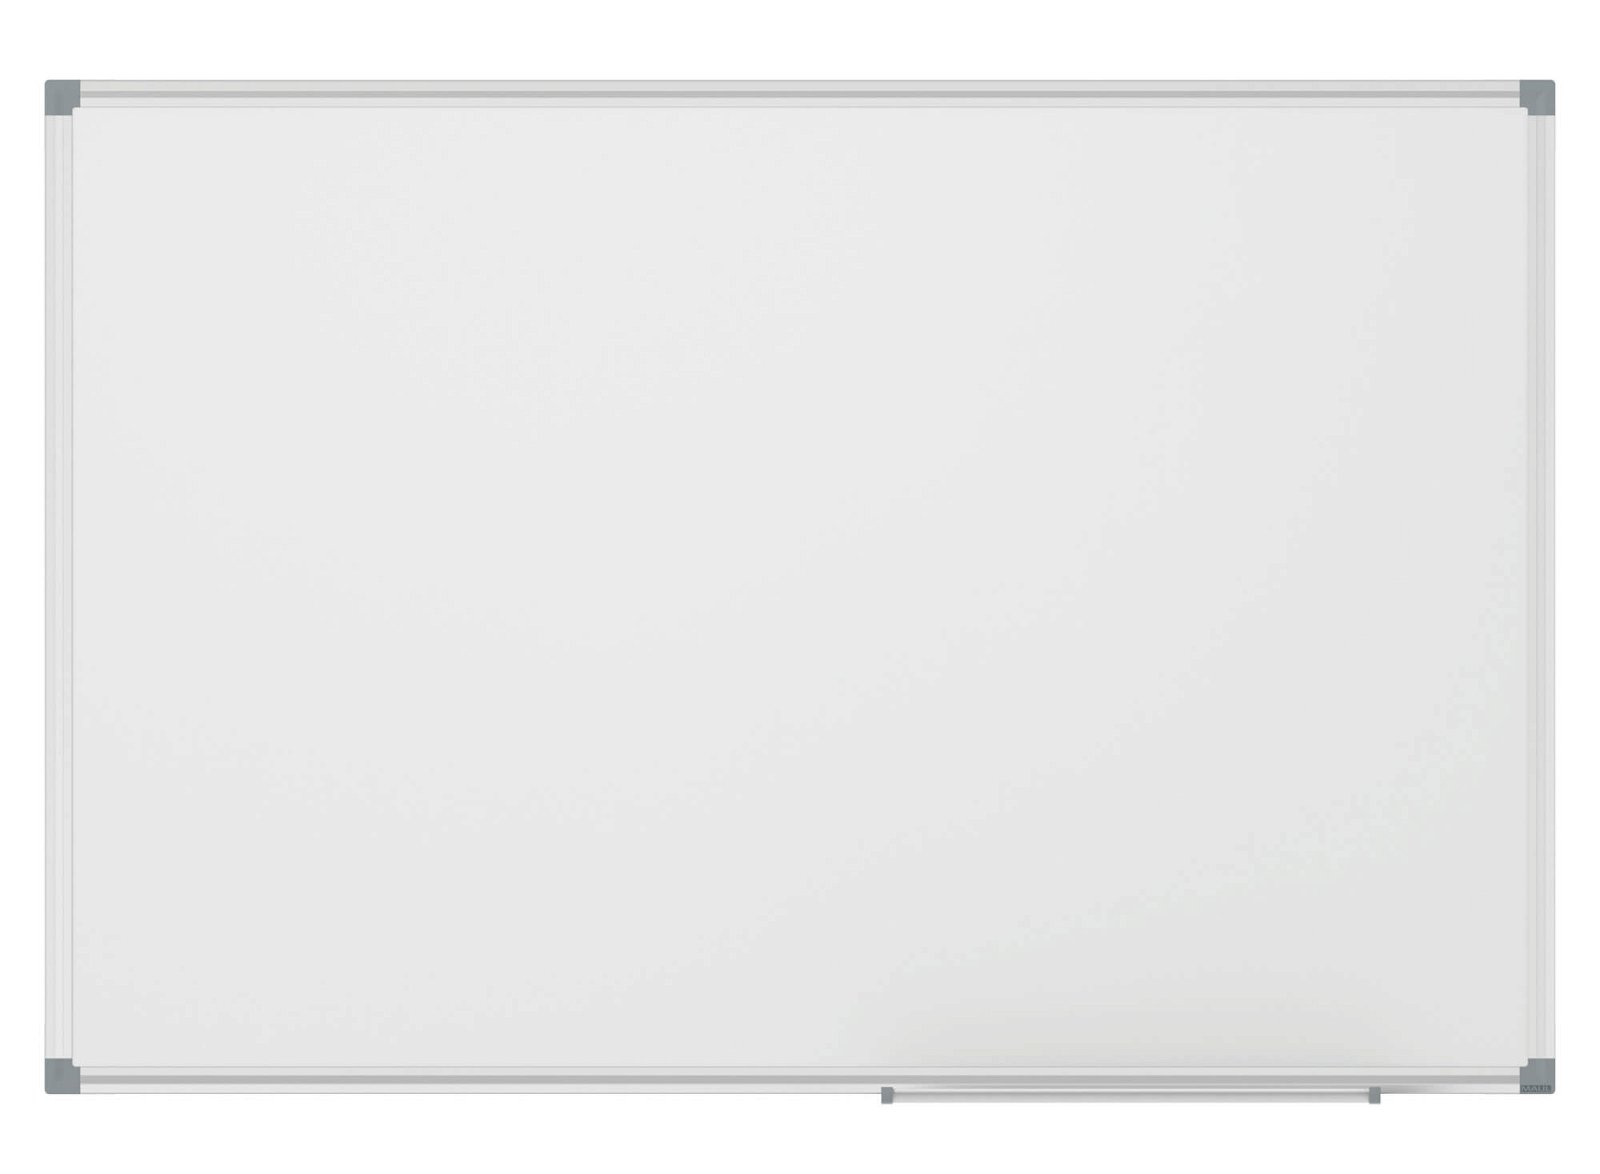 Whiteboard MAULstandard, Emaille, 30x45 cm, grau